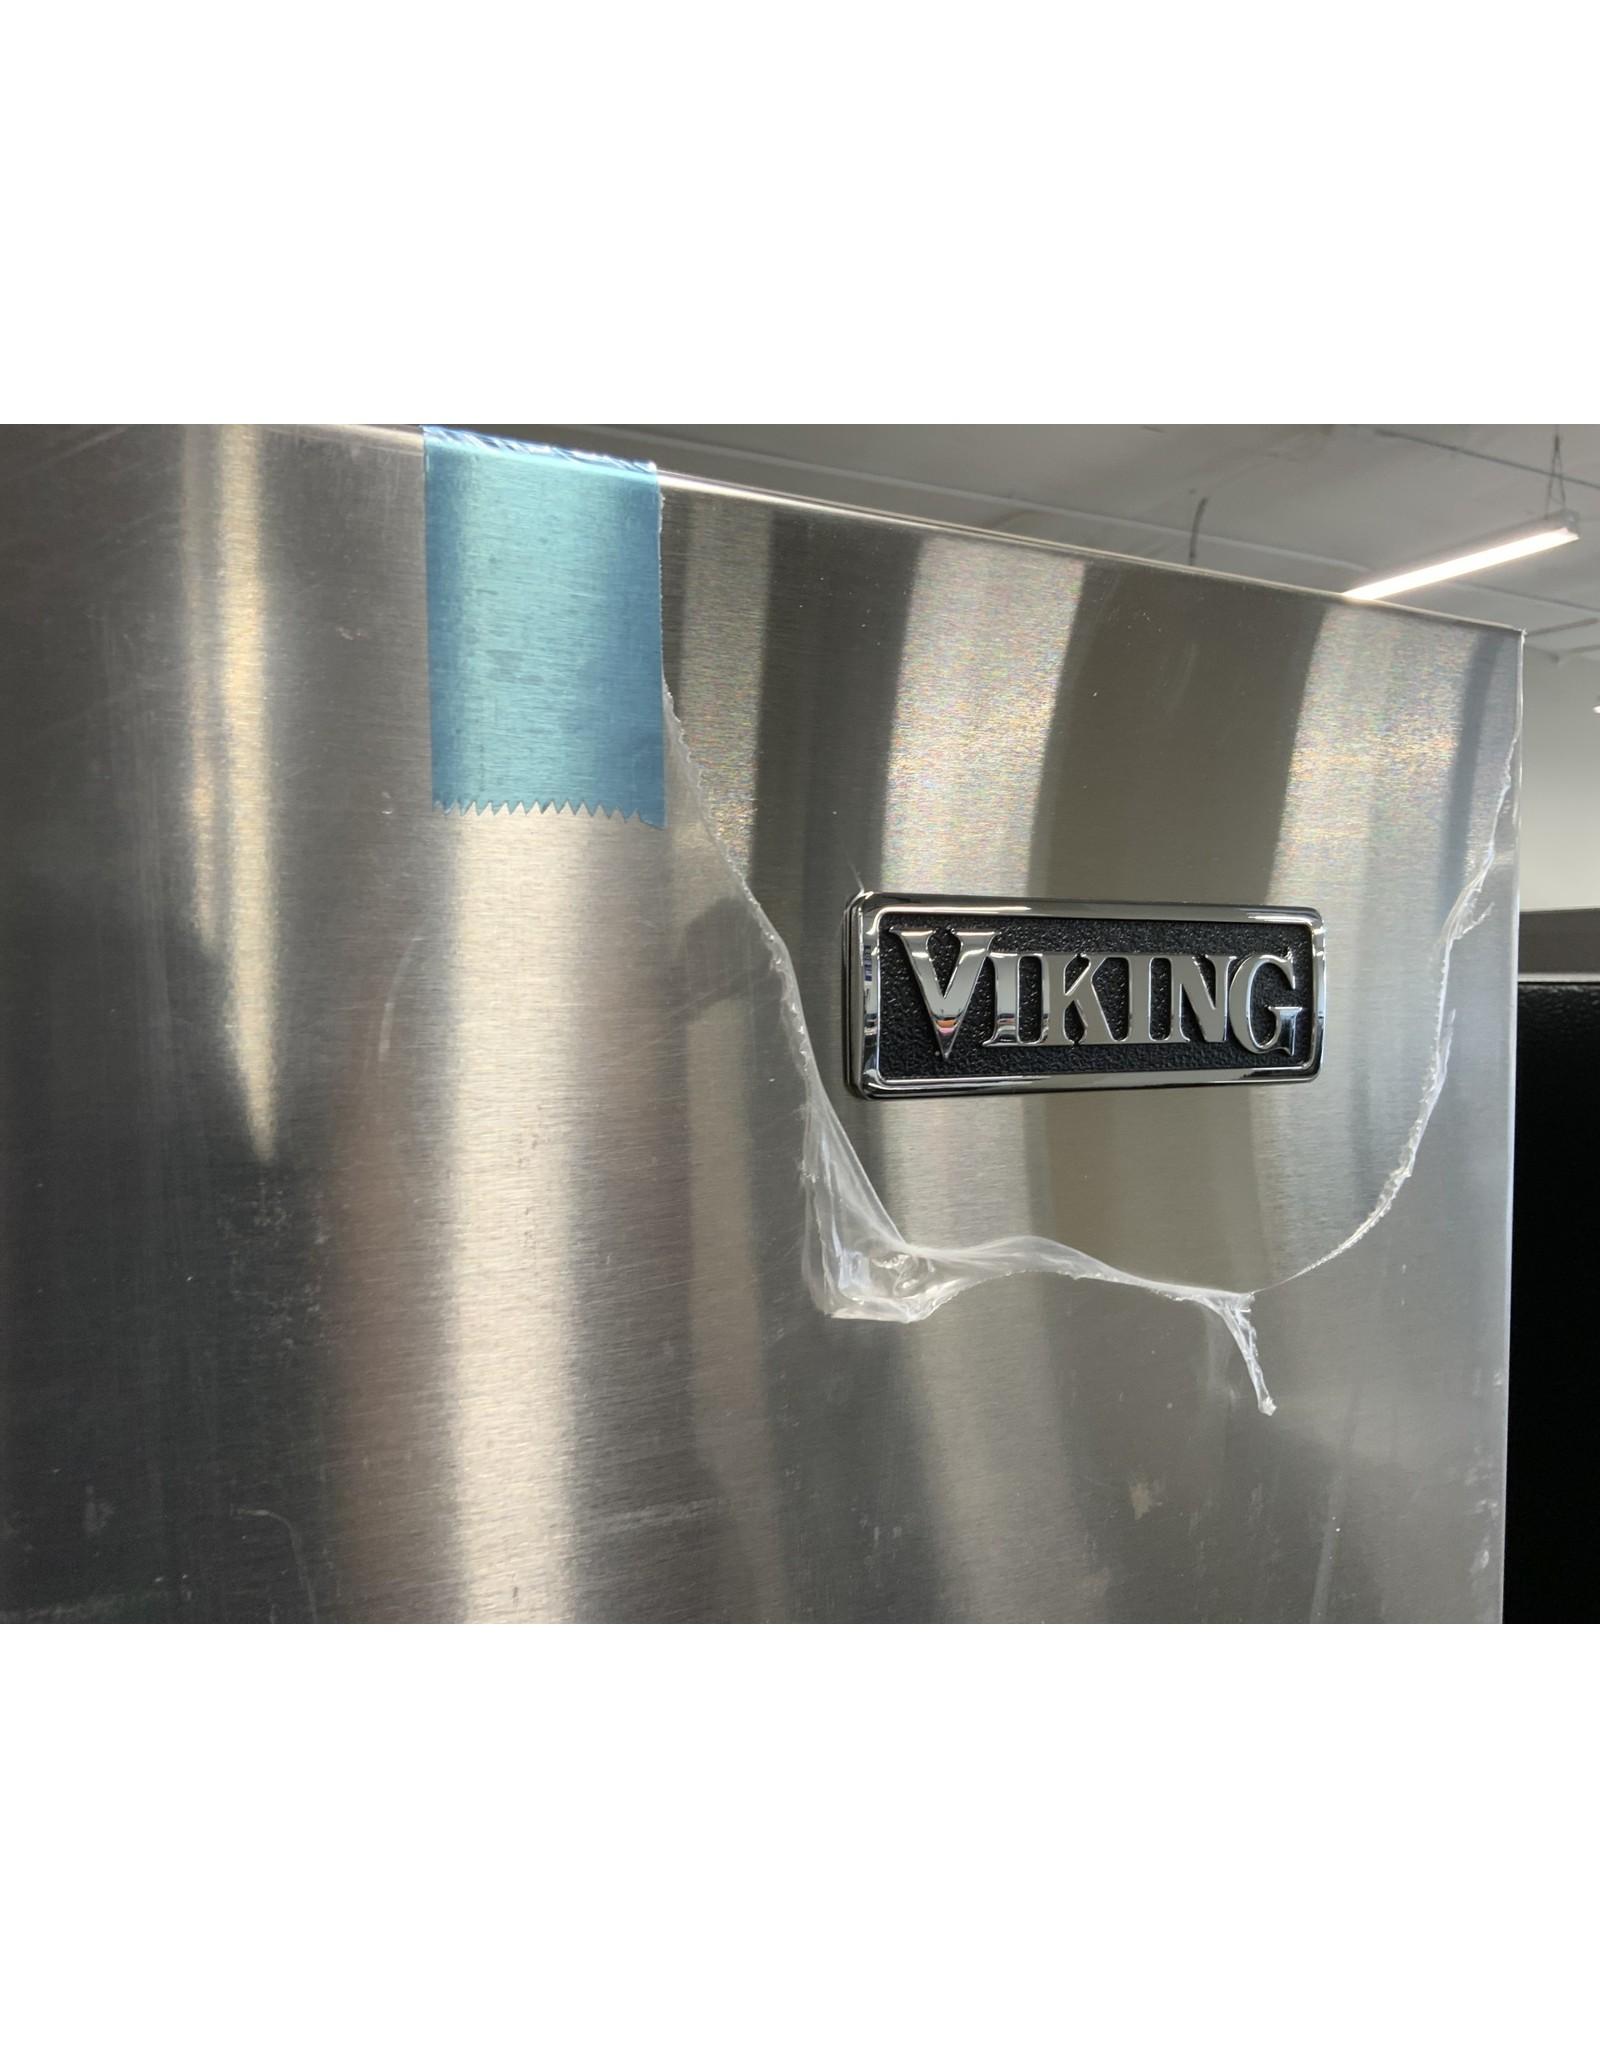 "Viking VIKING 36""W FRENCH DOOR BOTTOM FREEZER"